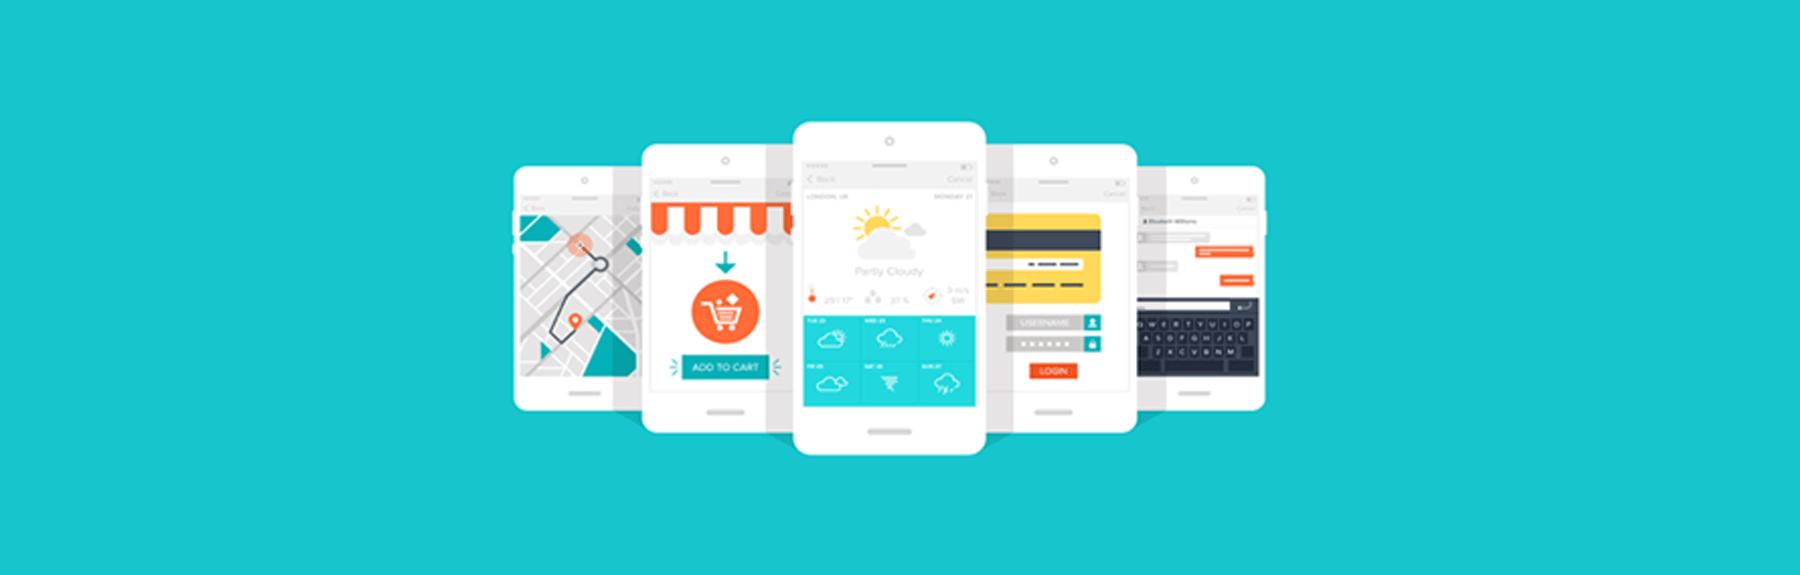 mobile-app-prototyping-benefits